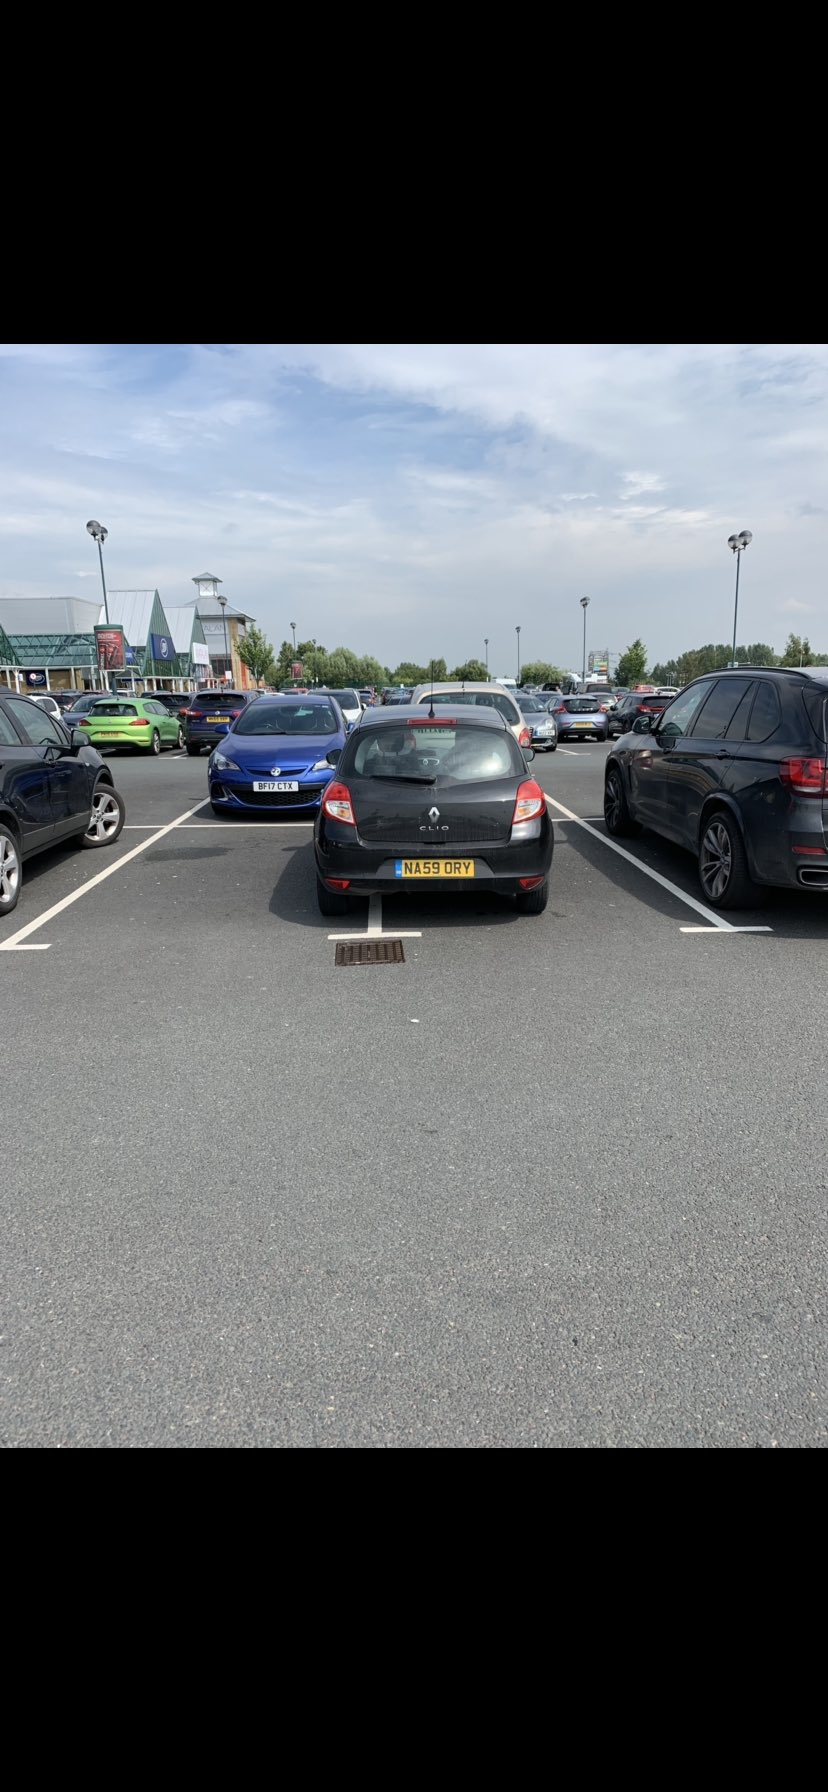 NA59 ORY displaying Selfish Parking